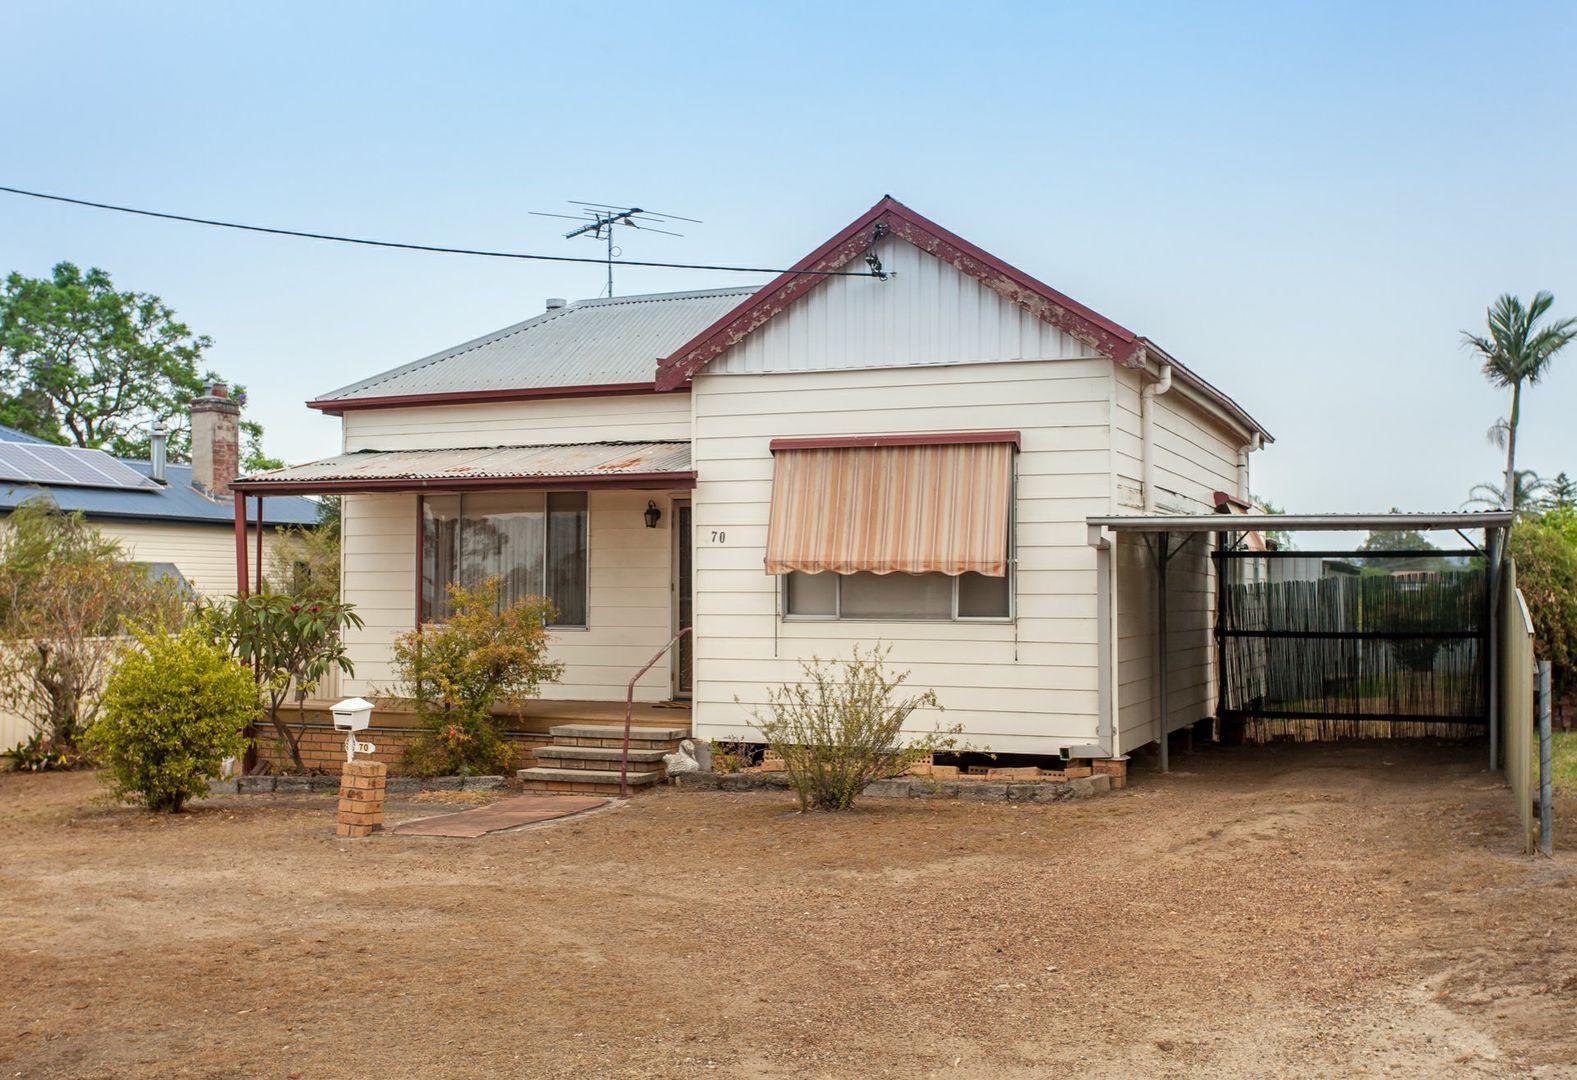 70 Armidale Street, Abermain NSW 2326, Image 0